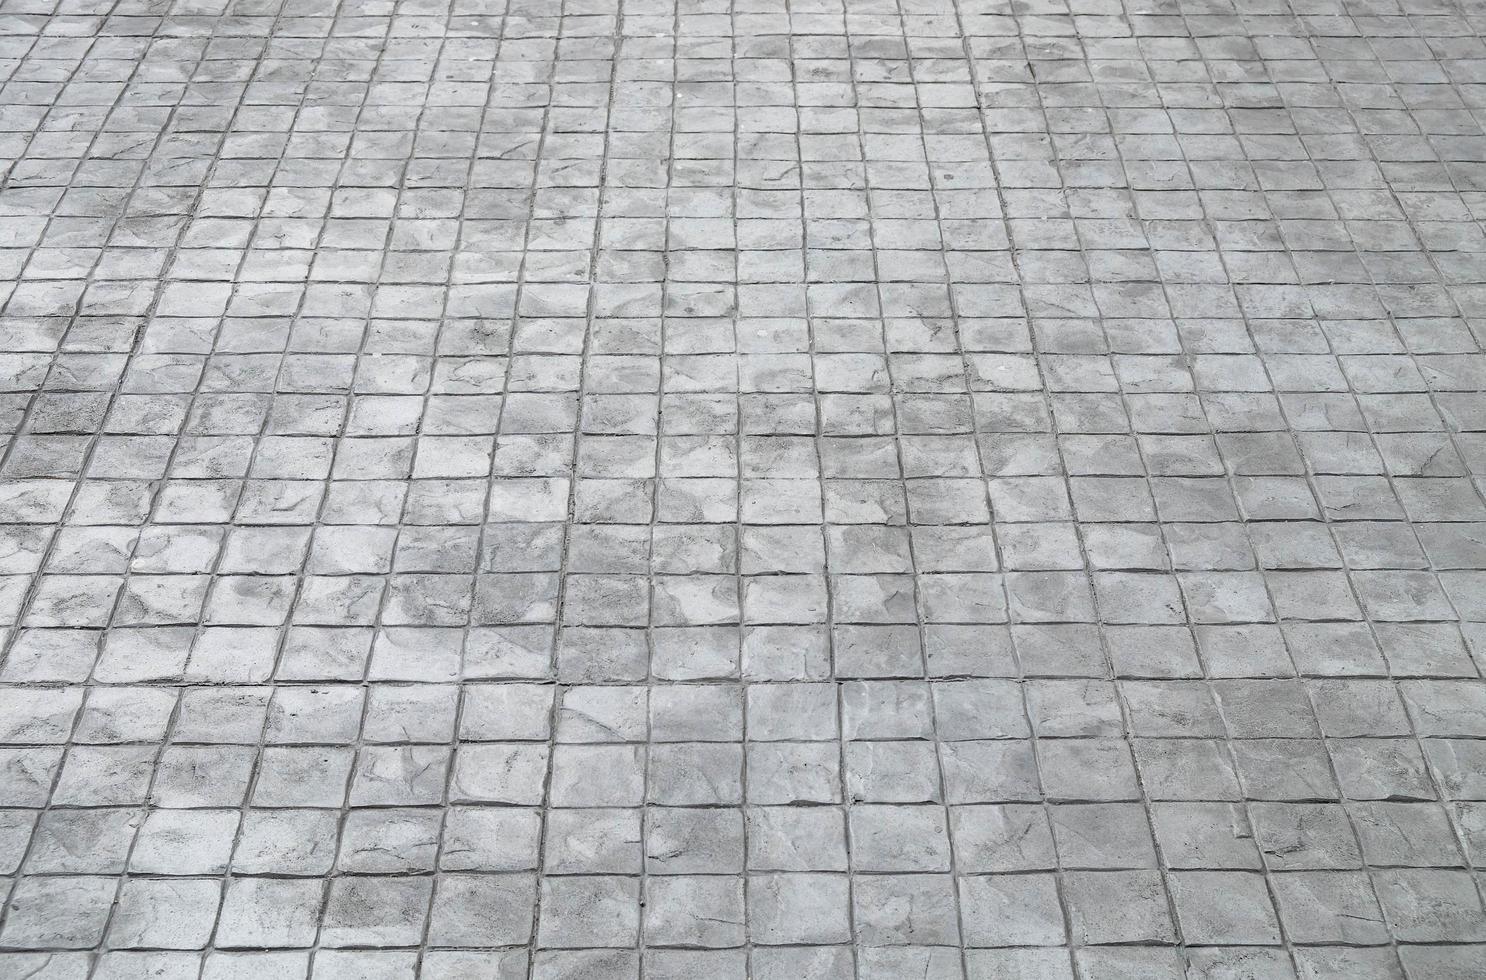 Square tile floor  photo